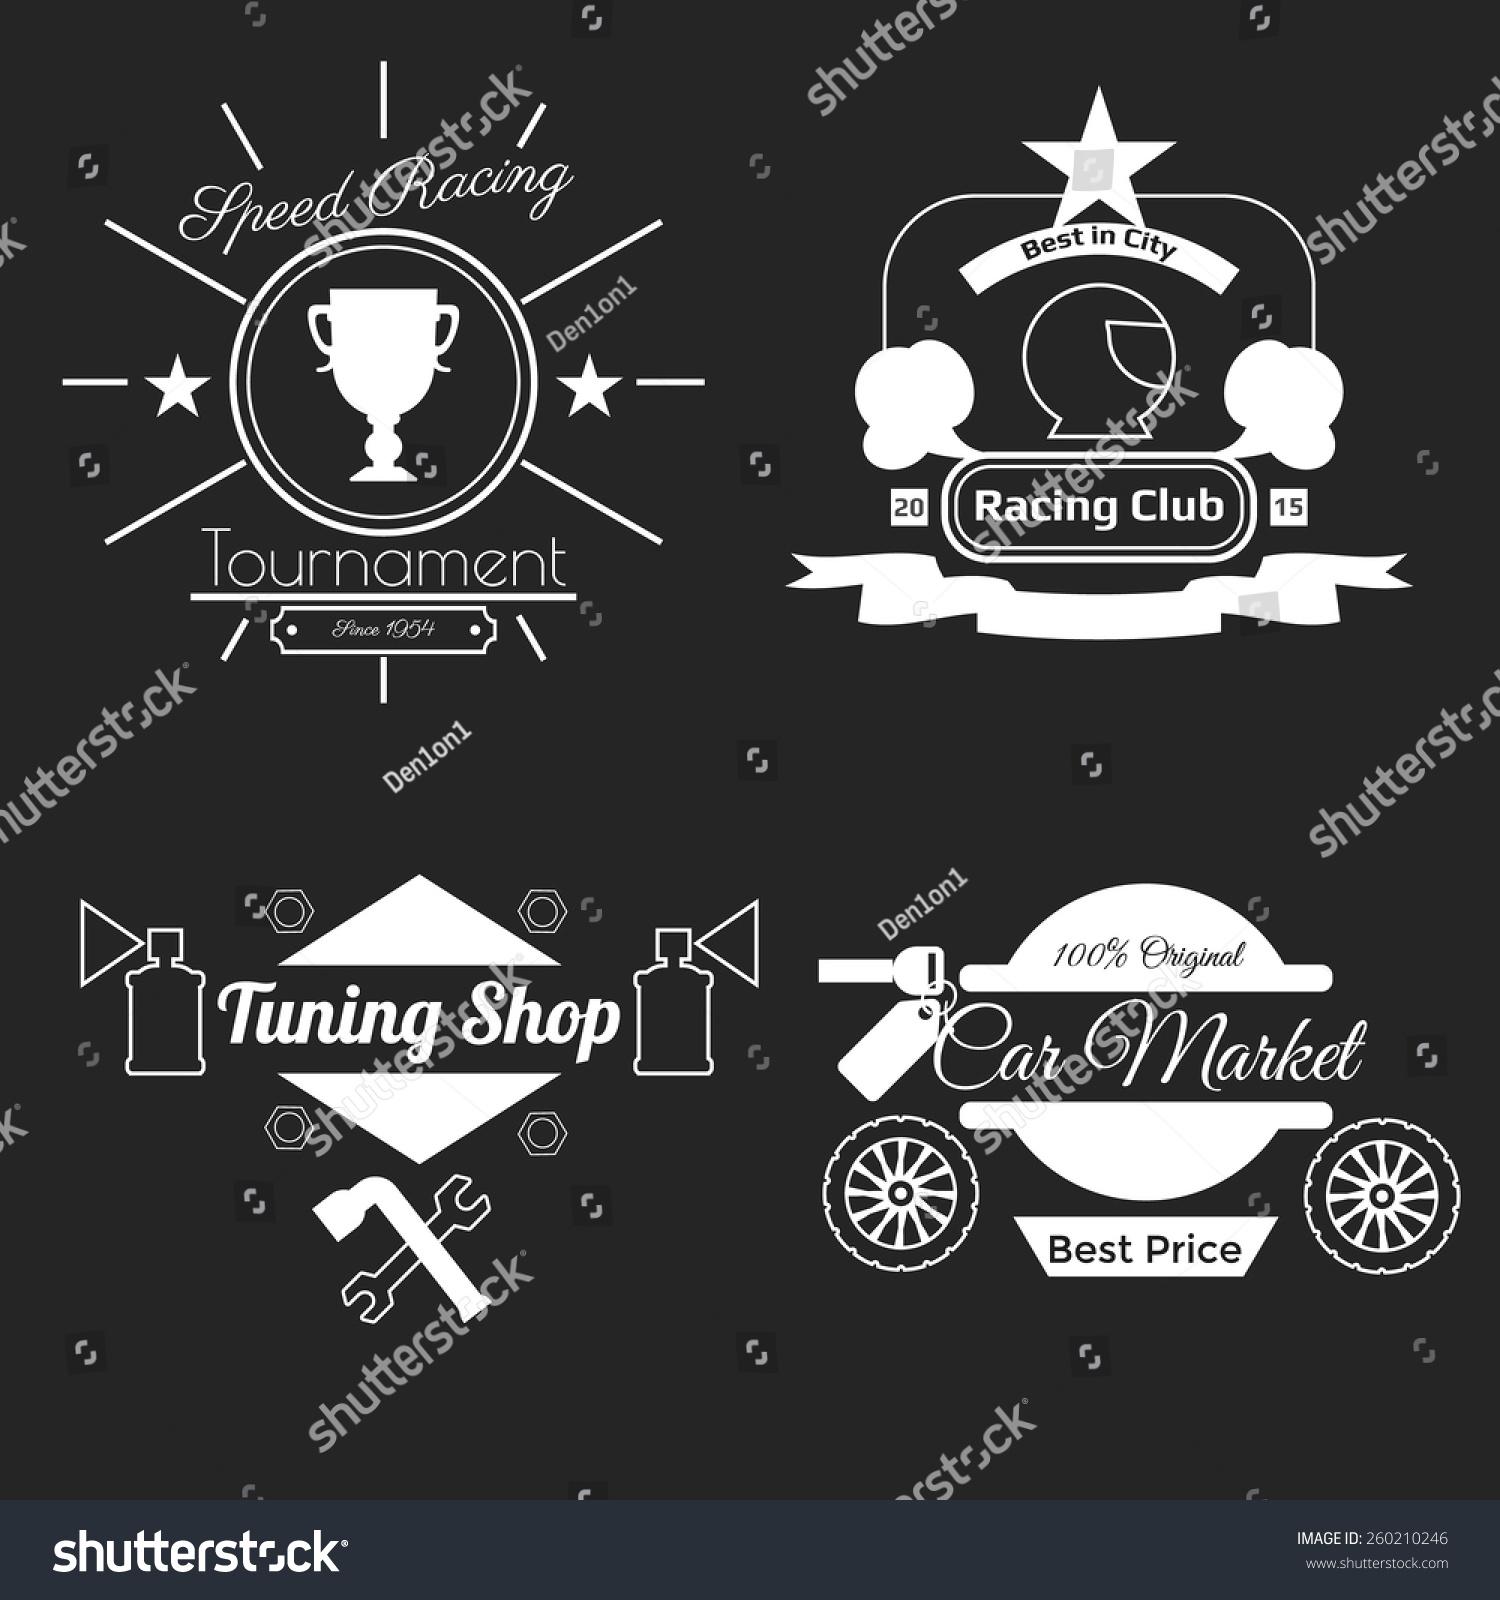 Design car club logo - White Car Theme Logos On Black Background In Flat Design Badges Tournament Racing